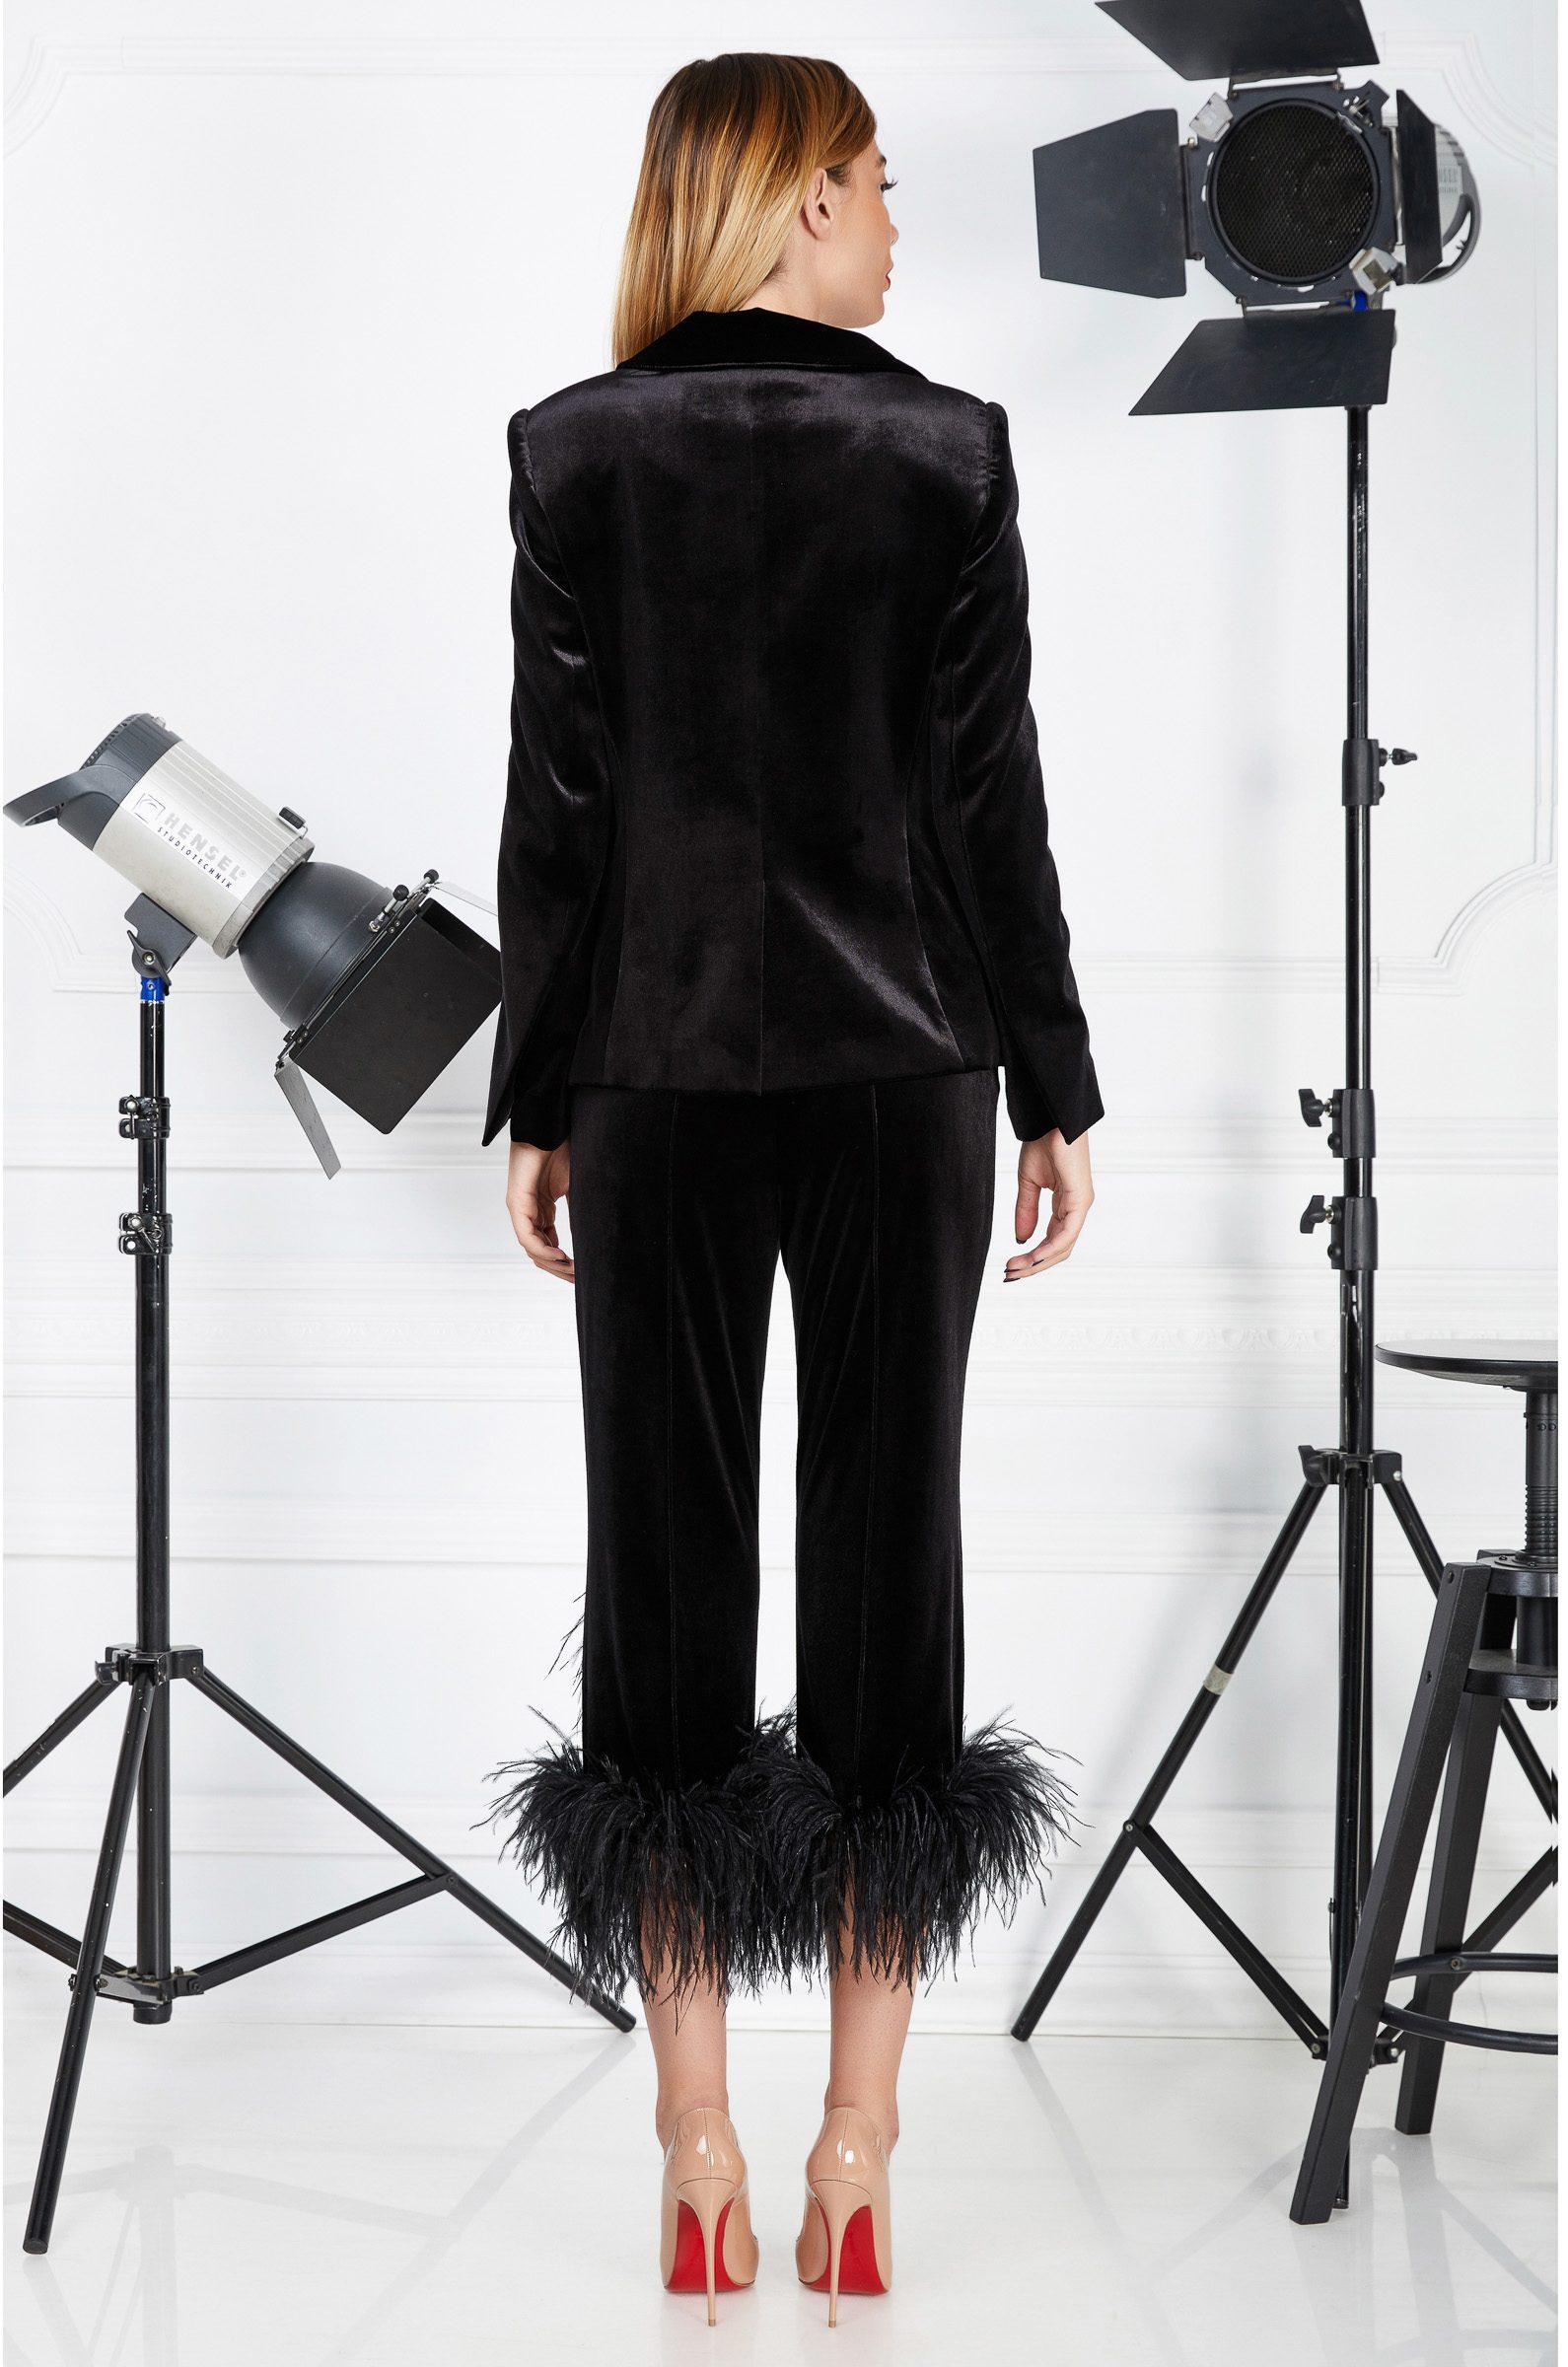 Black velvet cocktail suit